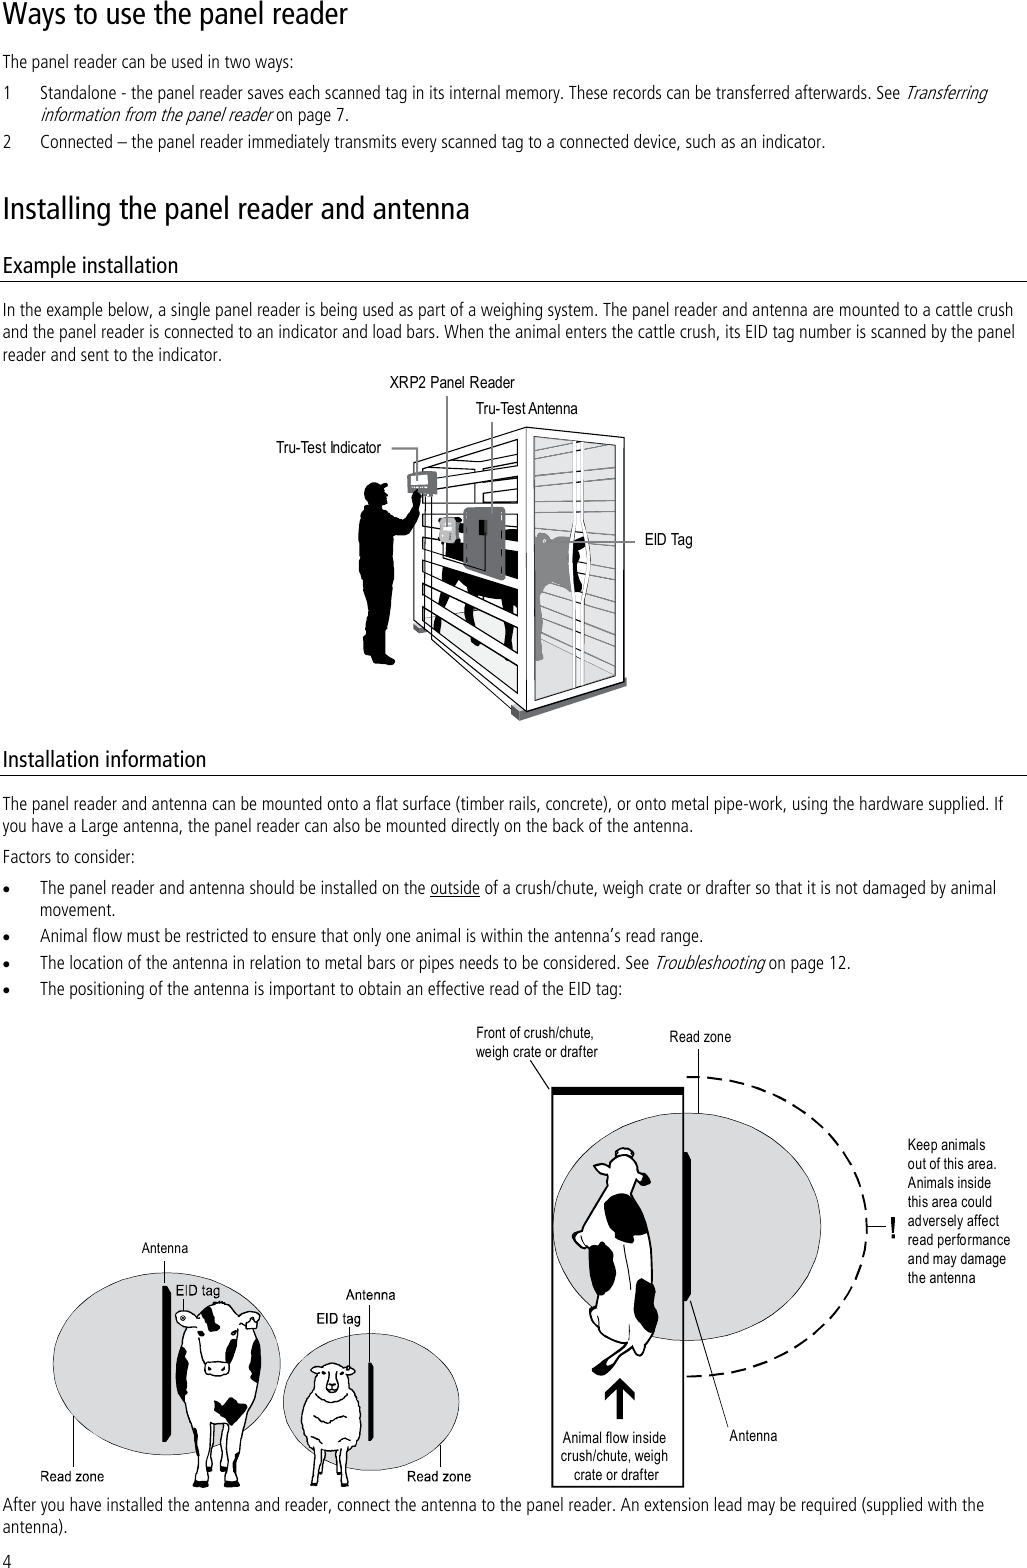 Tru Test XRP2-1 ANIMAL TAG RFID READER WITH BLUETOOTH MODULE User Manual